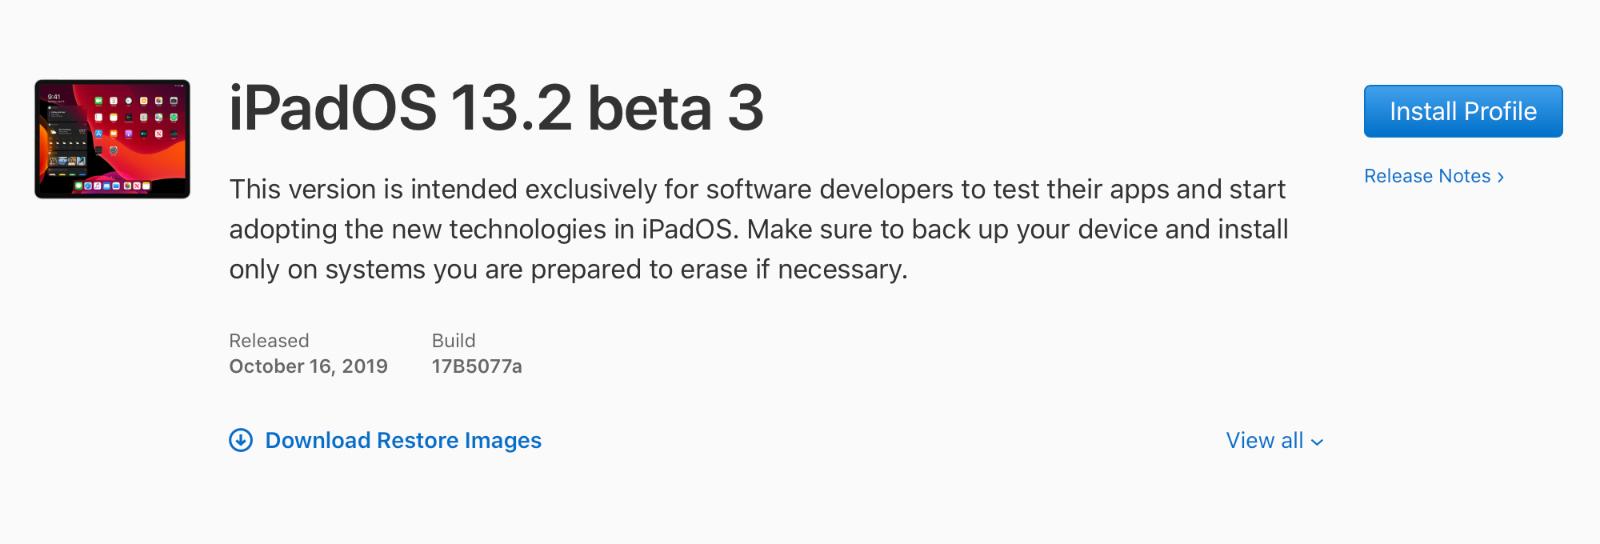 iOS 13.2 Beta 3, iPadOS 13.2 Beta 3, watchOS 6.1 beta 4 y tvOS 13.2 beta 3